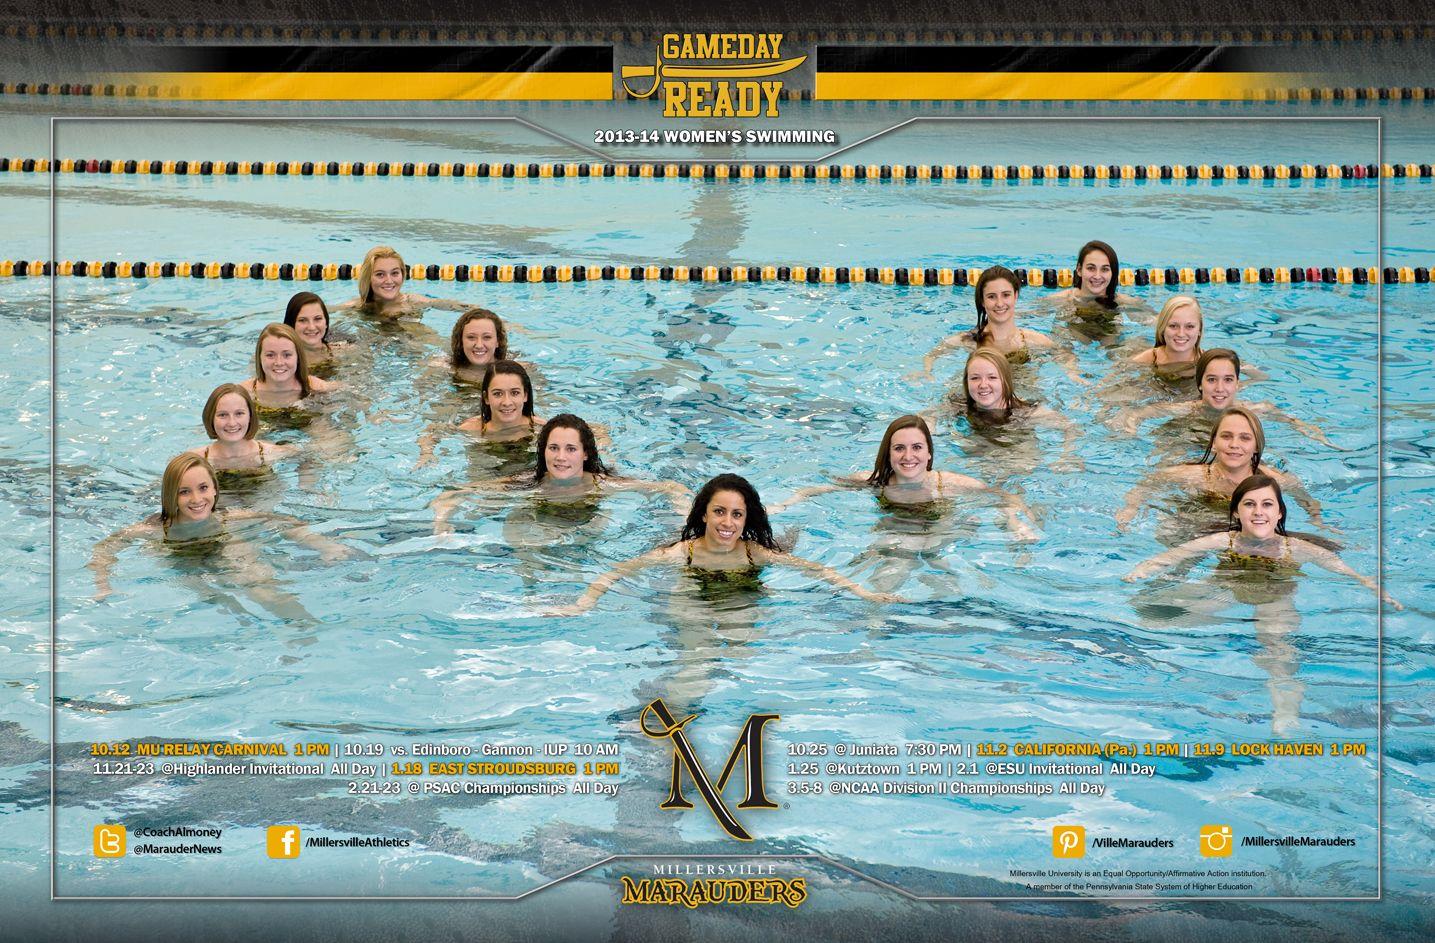 2013 14 Women S Swimming Team Poster Gamedayready Swim Team Swim Coach Swim 2017